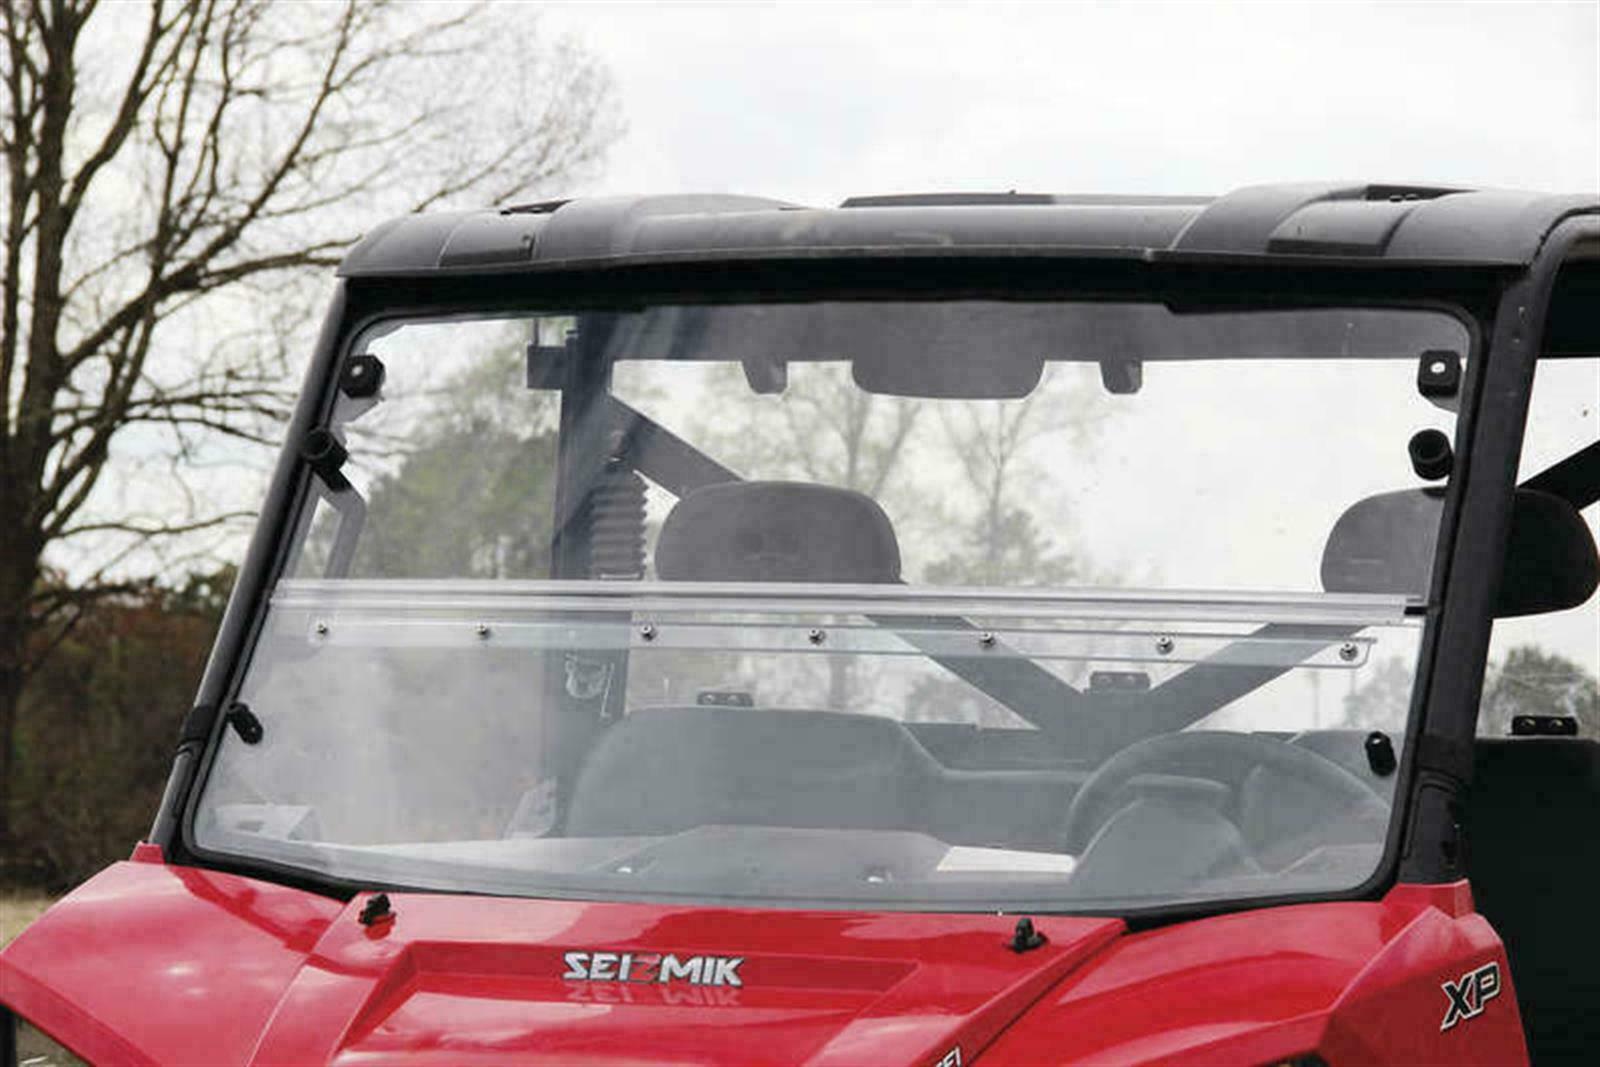 VINYL WINDSHIELD for 2013 POLARIS RANGER MIDSIZE 800 EFI 400 500 EV Crew Window